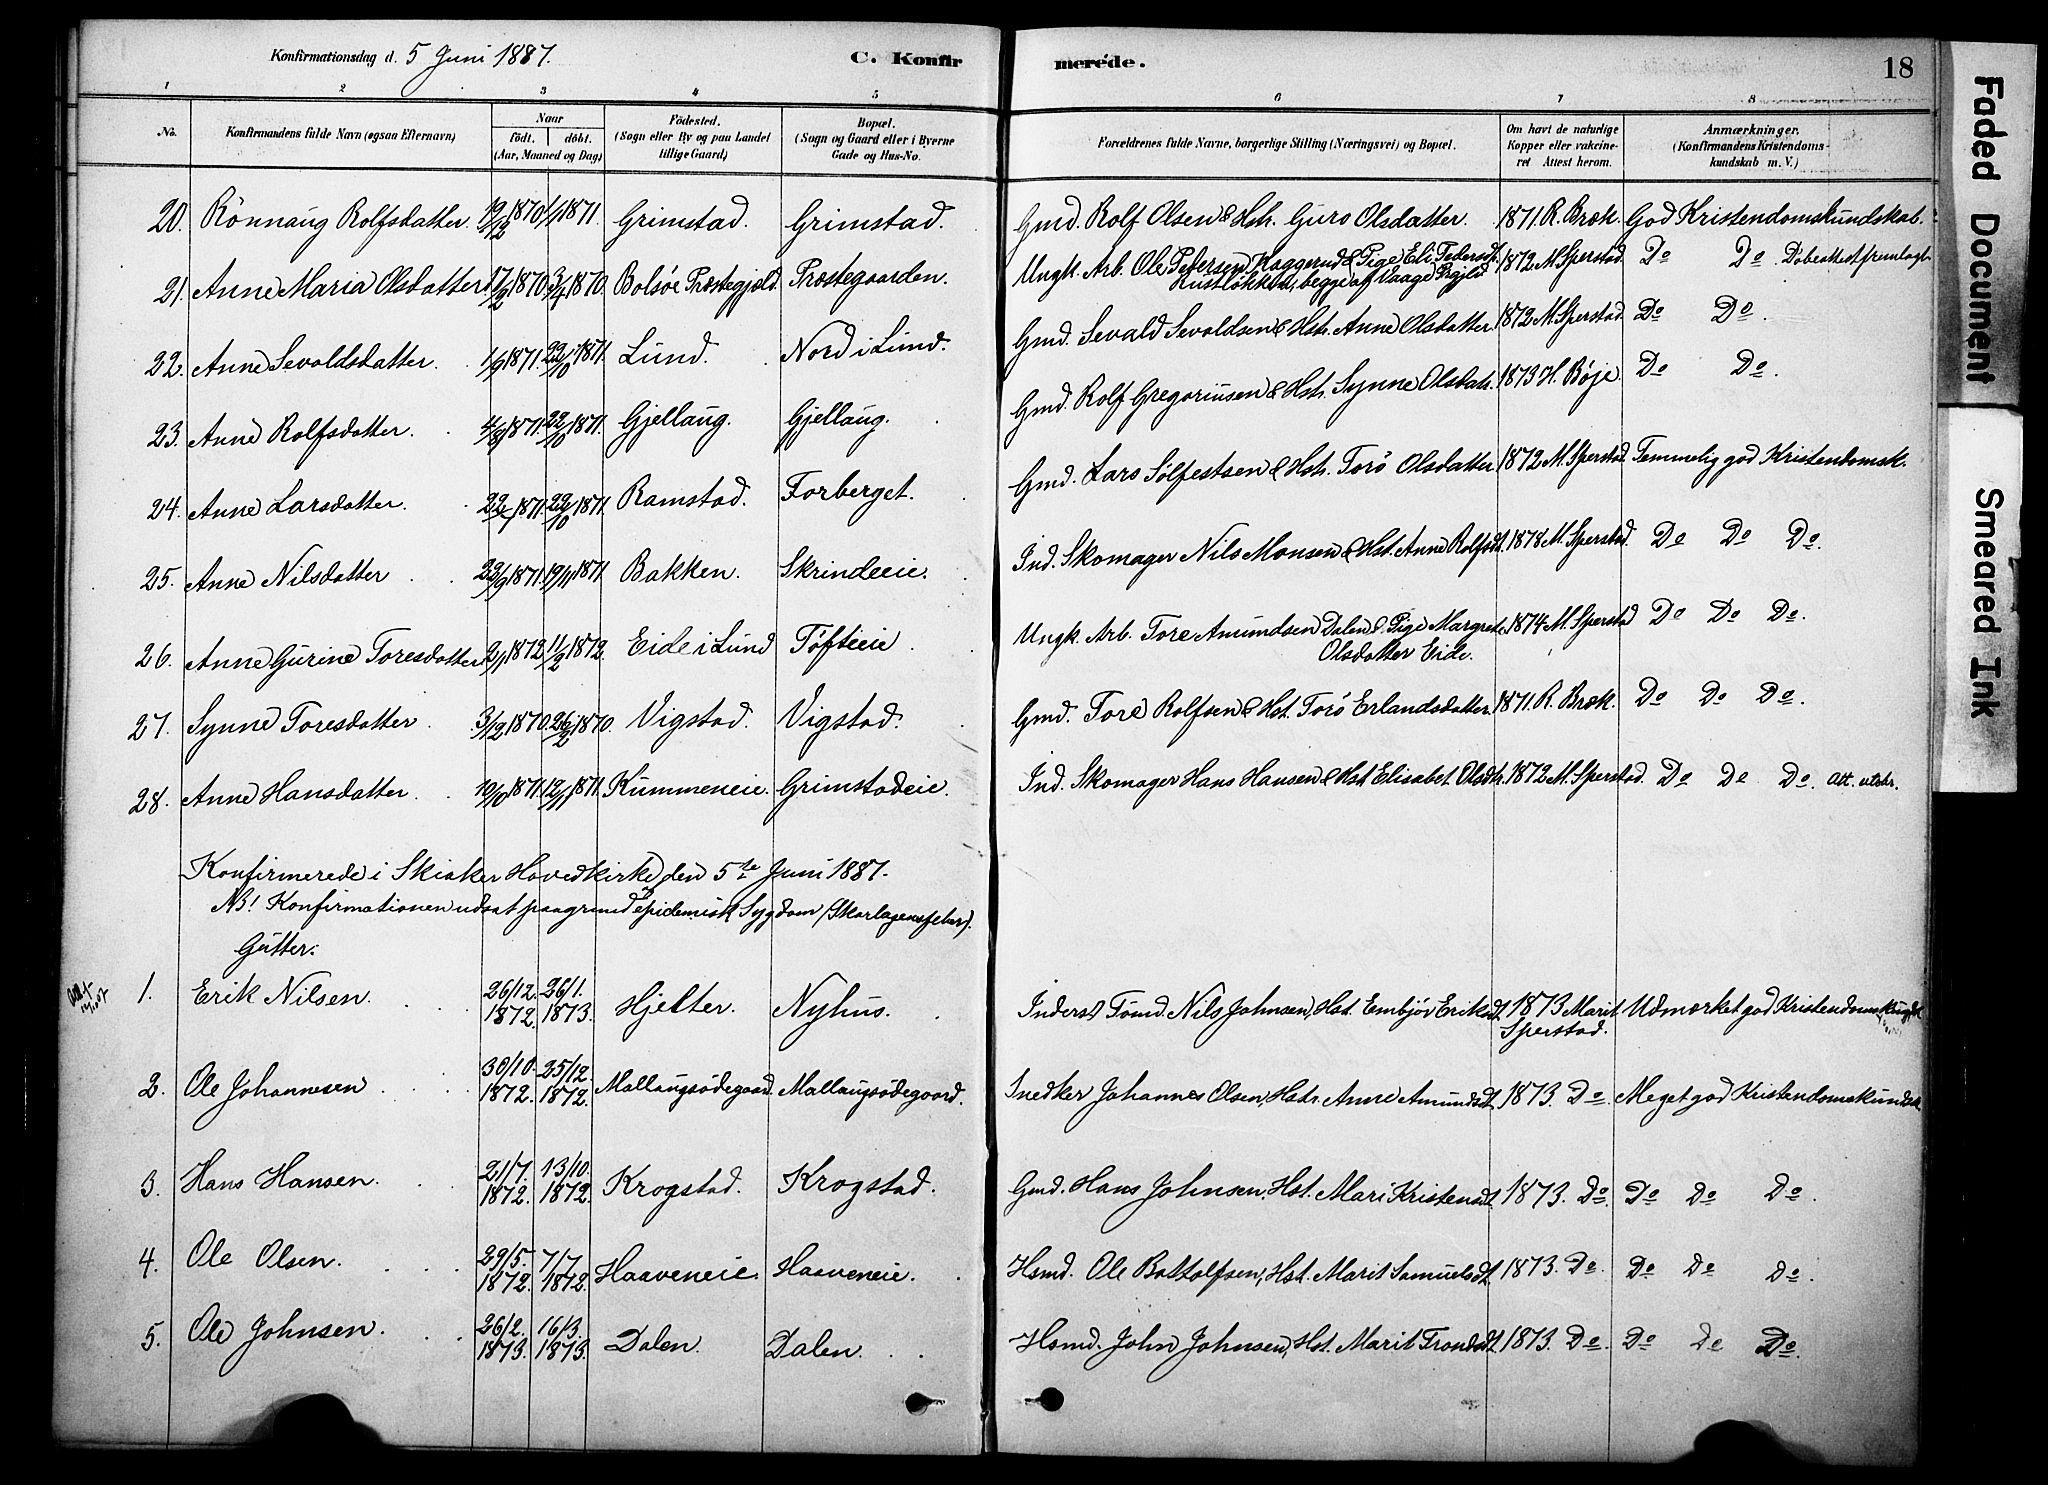 SAH, Skjåk prestekontor, Ministerialbok nr. 2, 1878-1907, s. 18